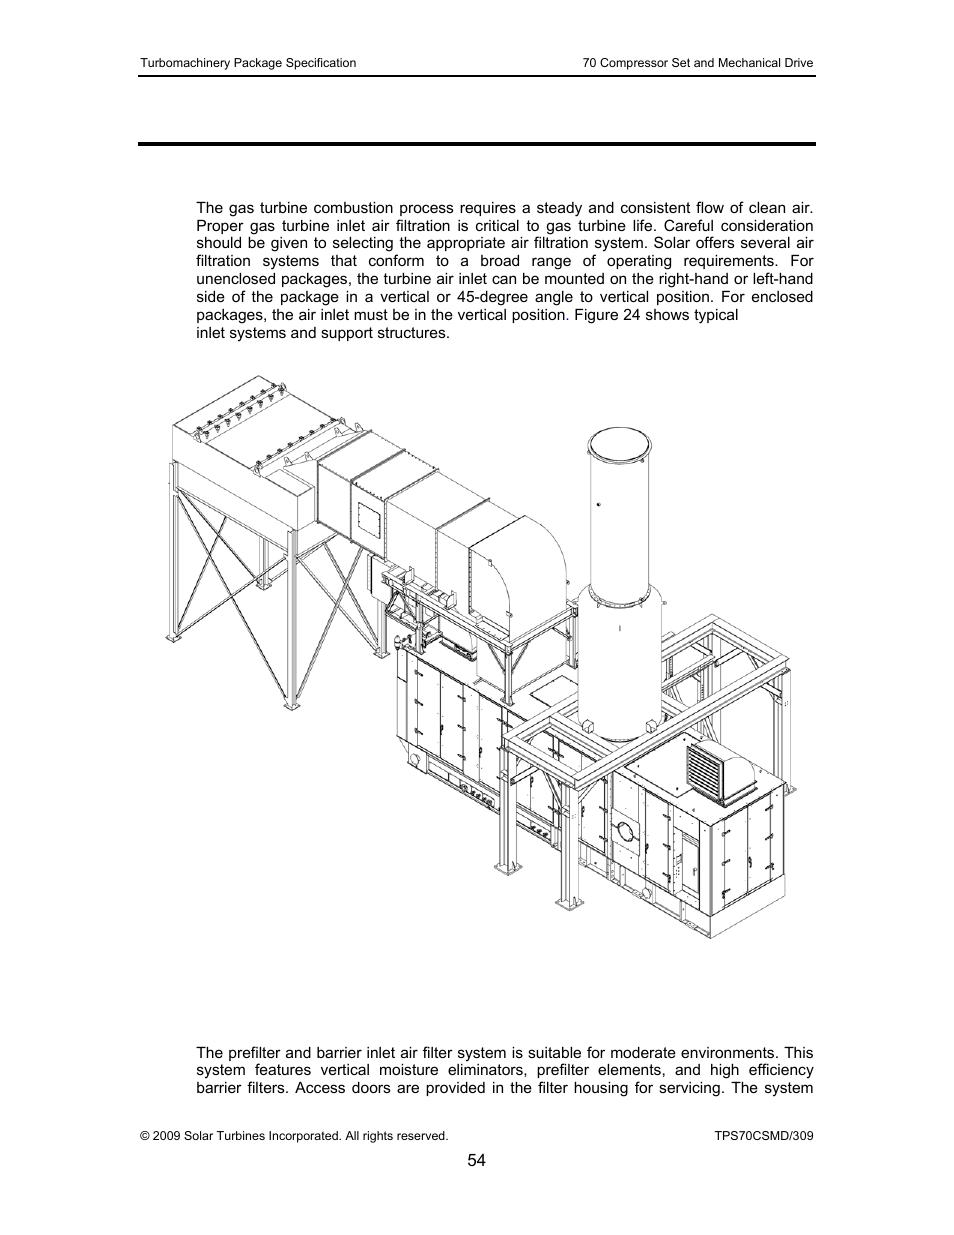 13 air inlet system, 1 general description, 1 prefilter